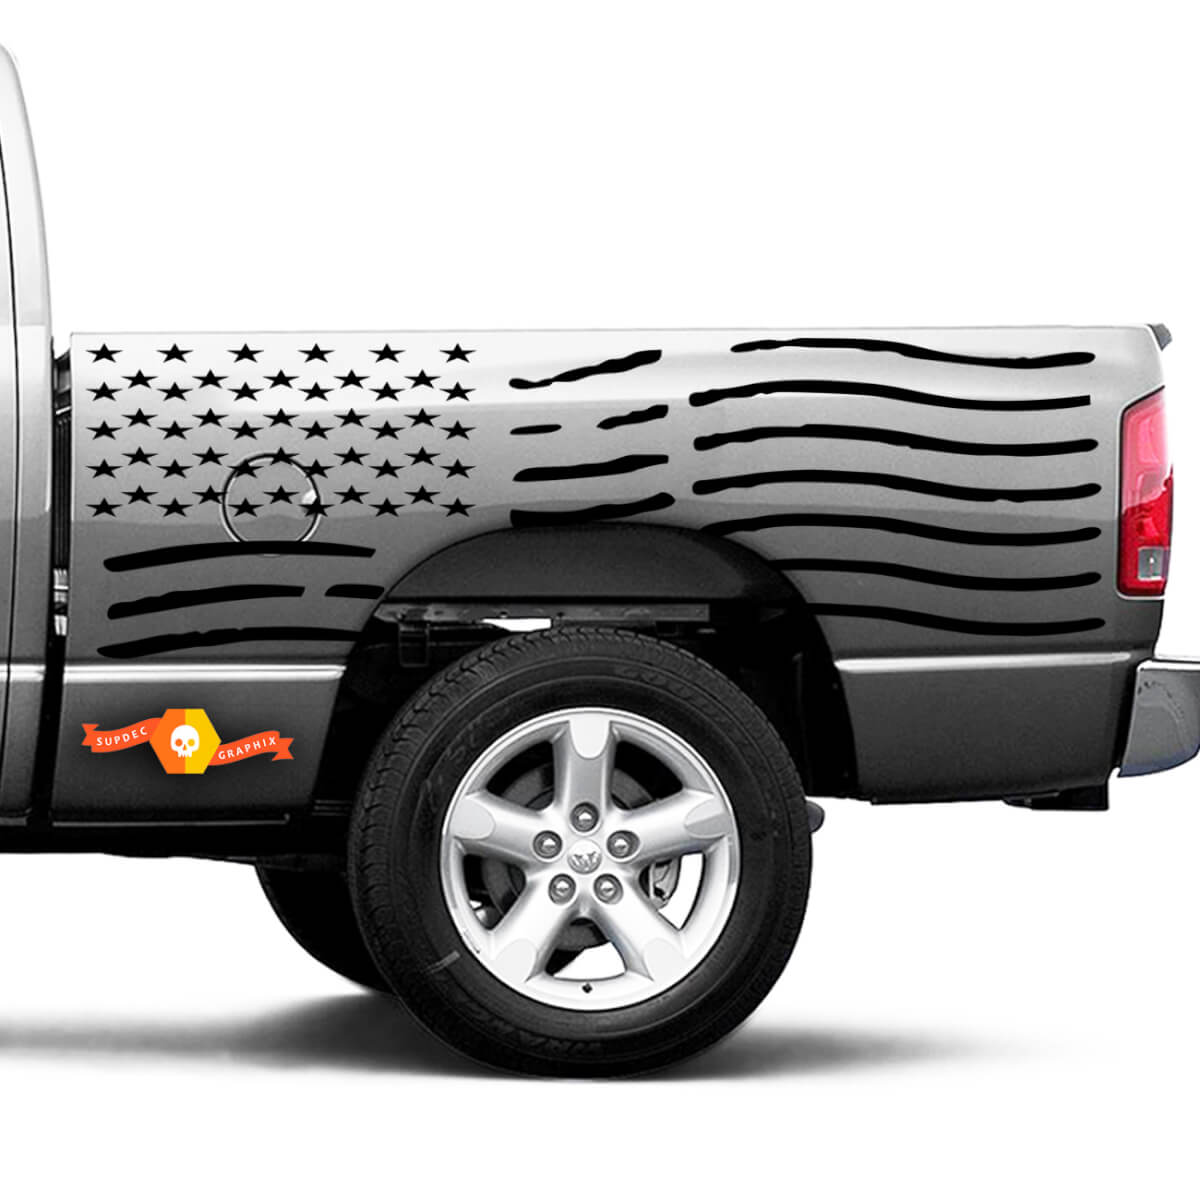 Distressed amerikanische Flagge Dodge Ram Bett Side Truck Vinyl Aufkleber Grafik Cast SUV